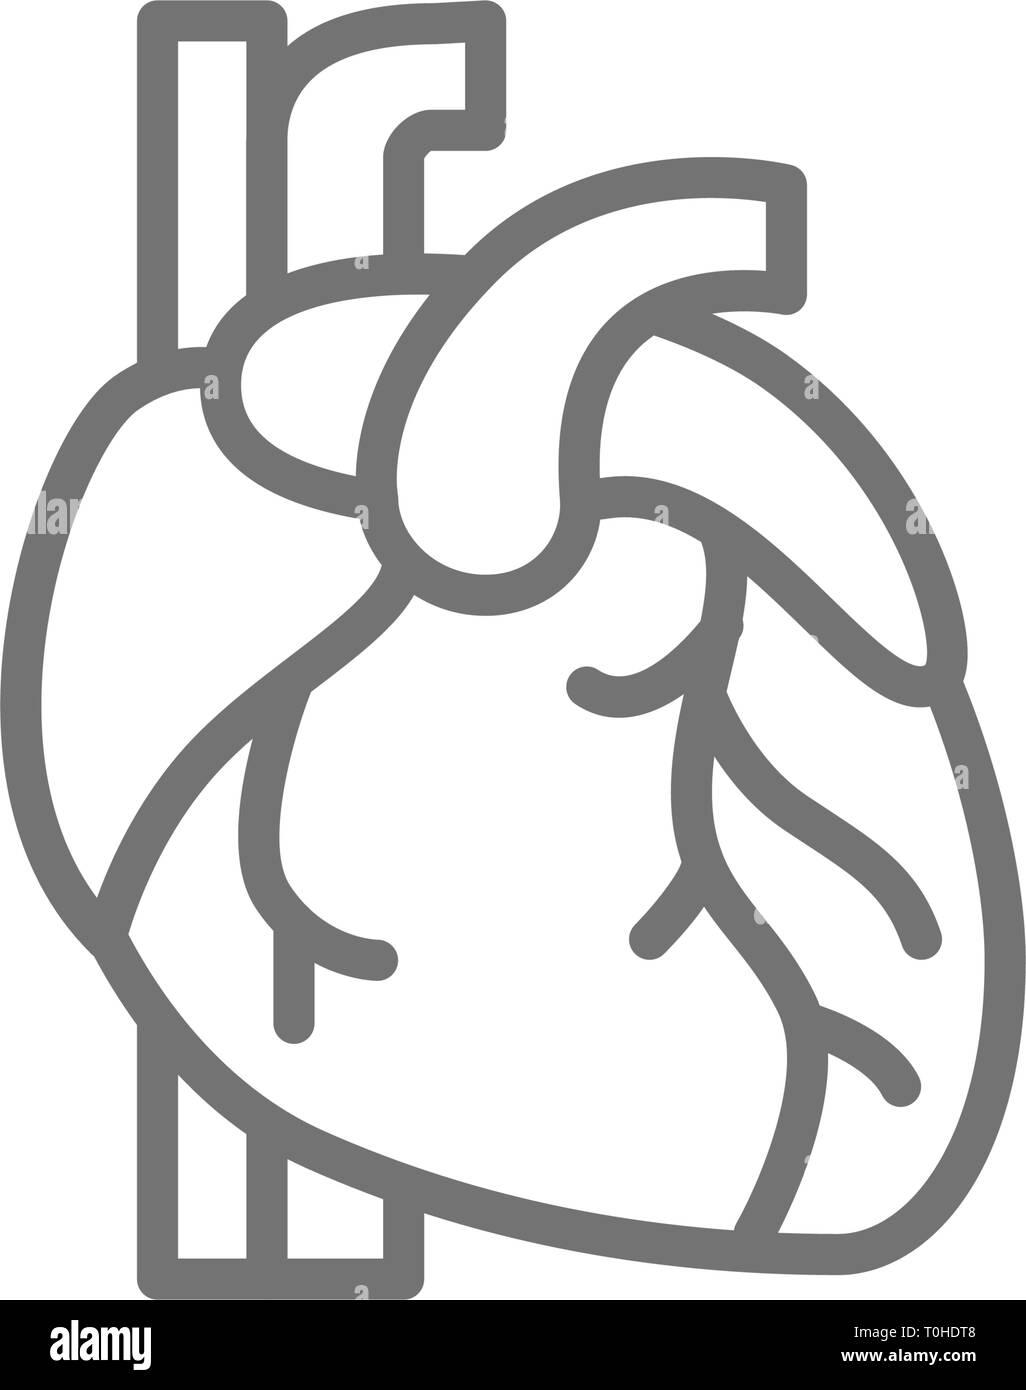 Heart, artery, vein, human organ line icon. - Stock Image